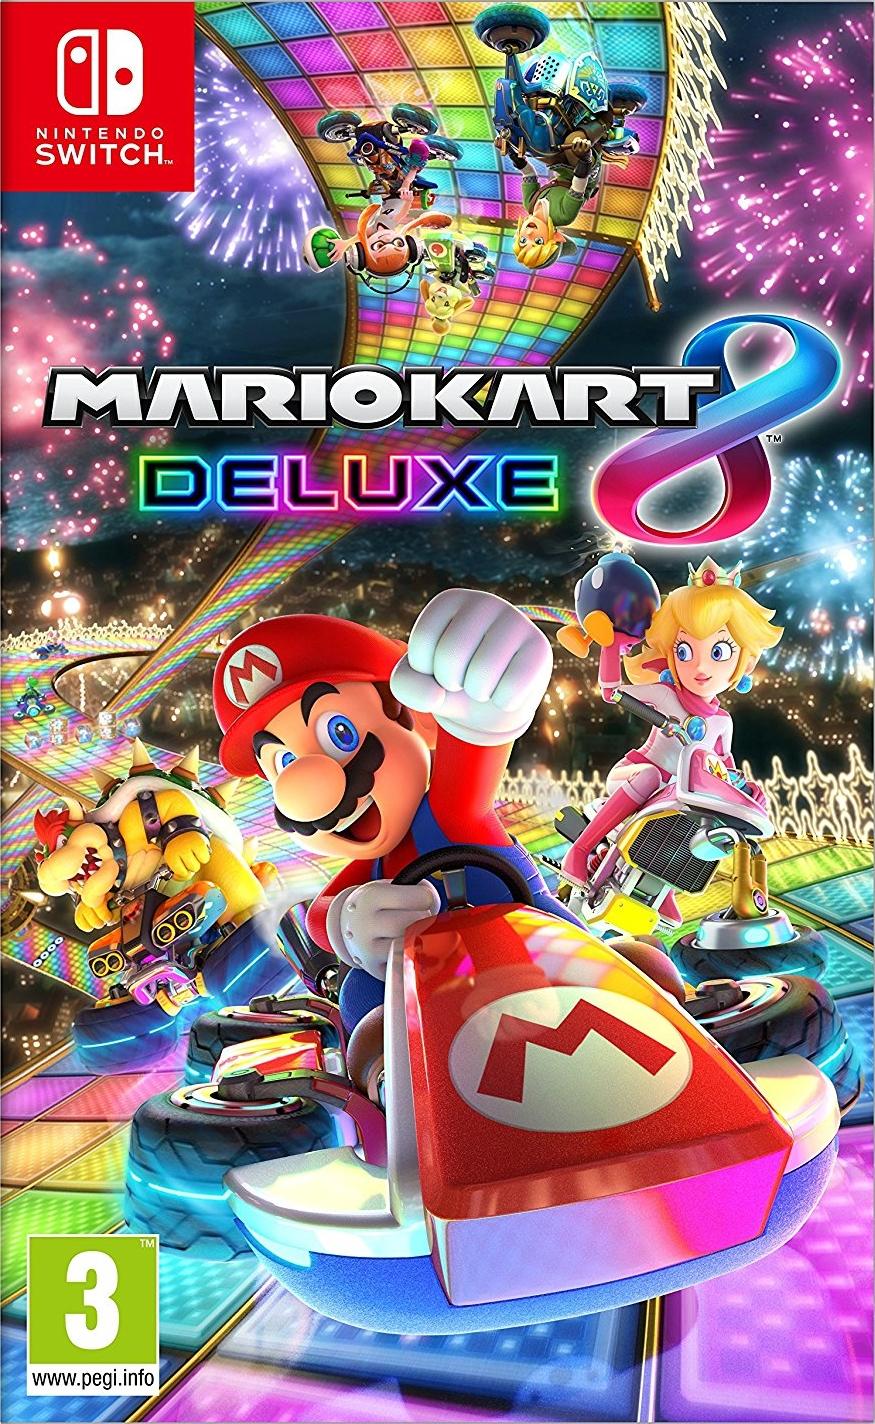 Nintendo's first UK no. 1 since 2011